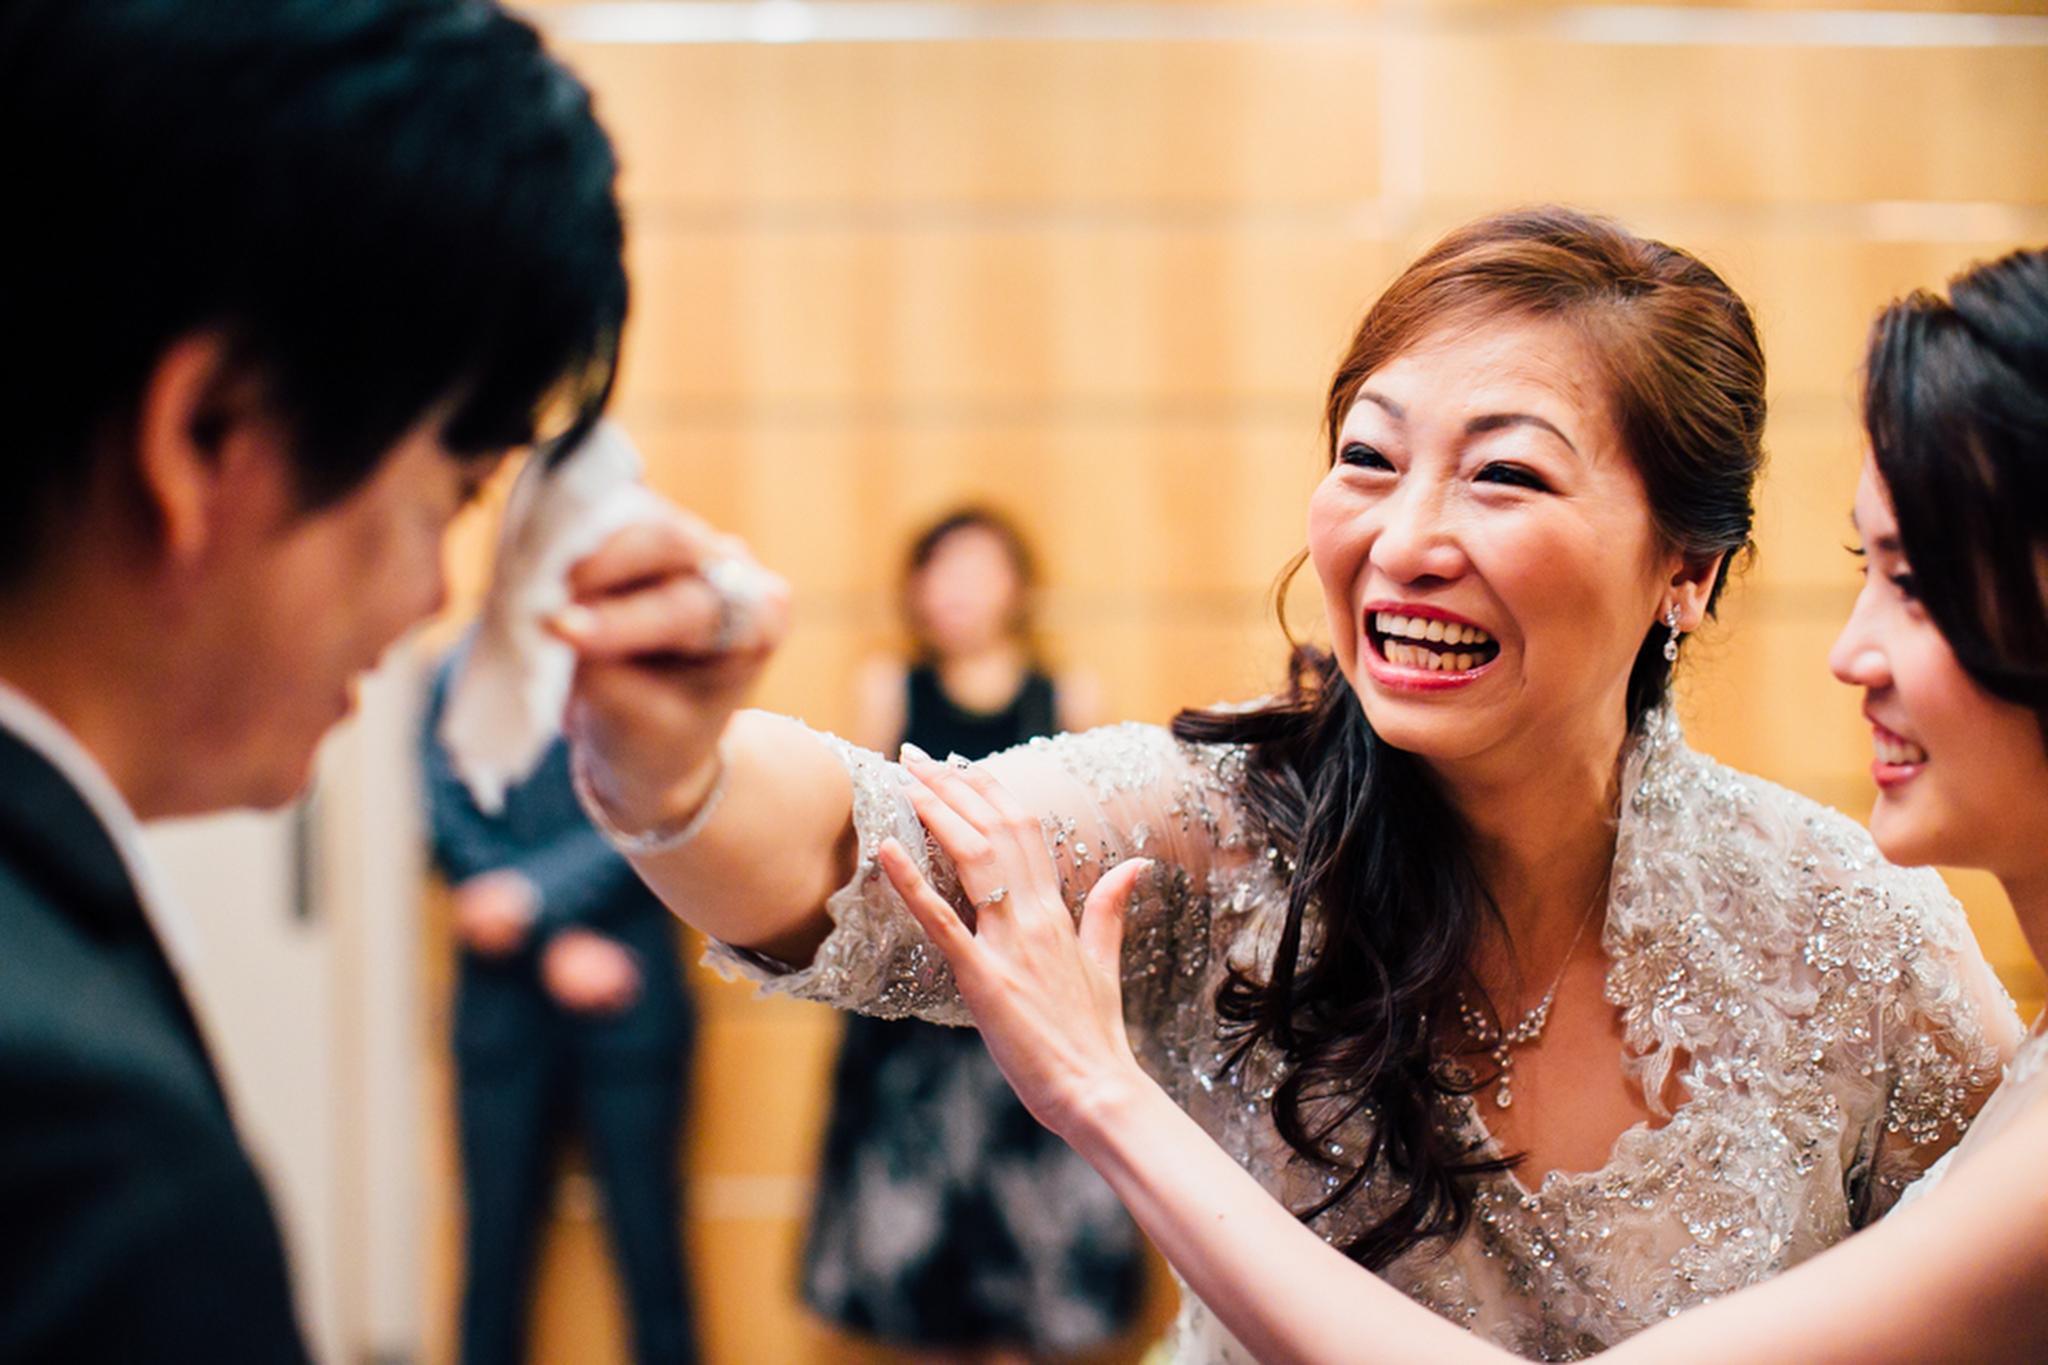 Singapore Wedding Photographer - Joey & Amily Wedding Day (102 of 154).JPG